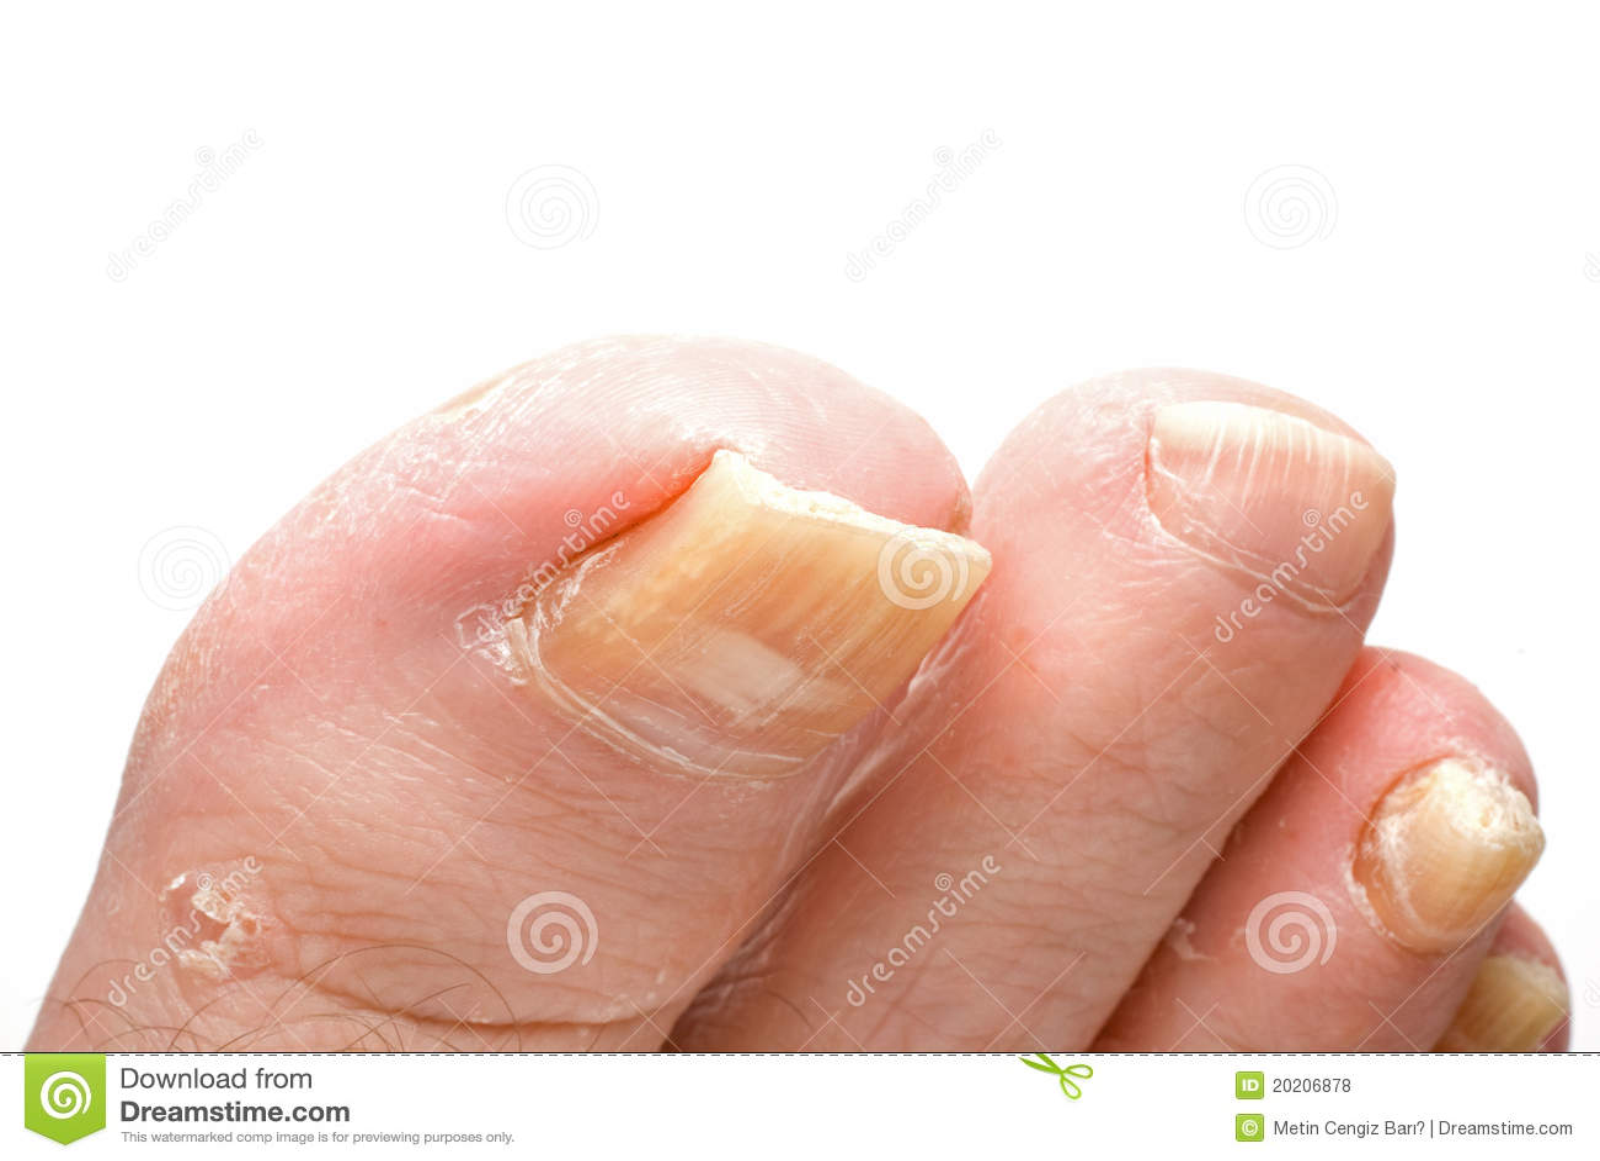 Toenail Fungus stock photo. Image of foot, white, medicine